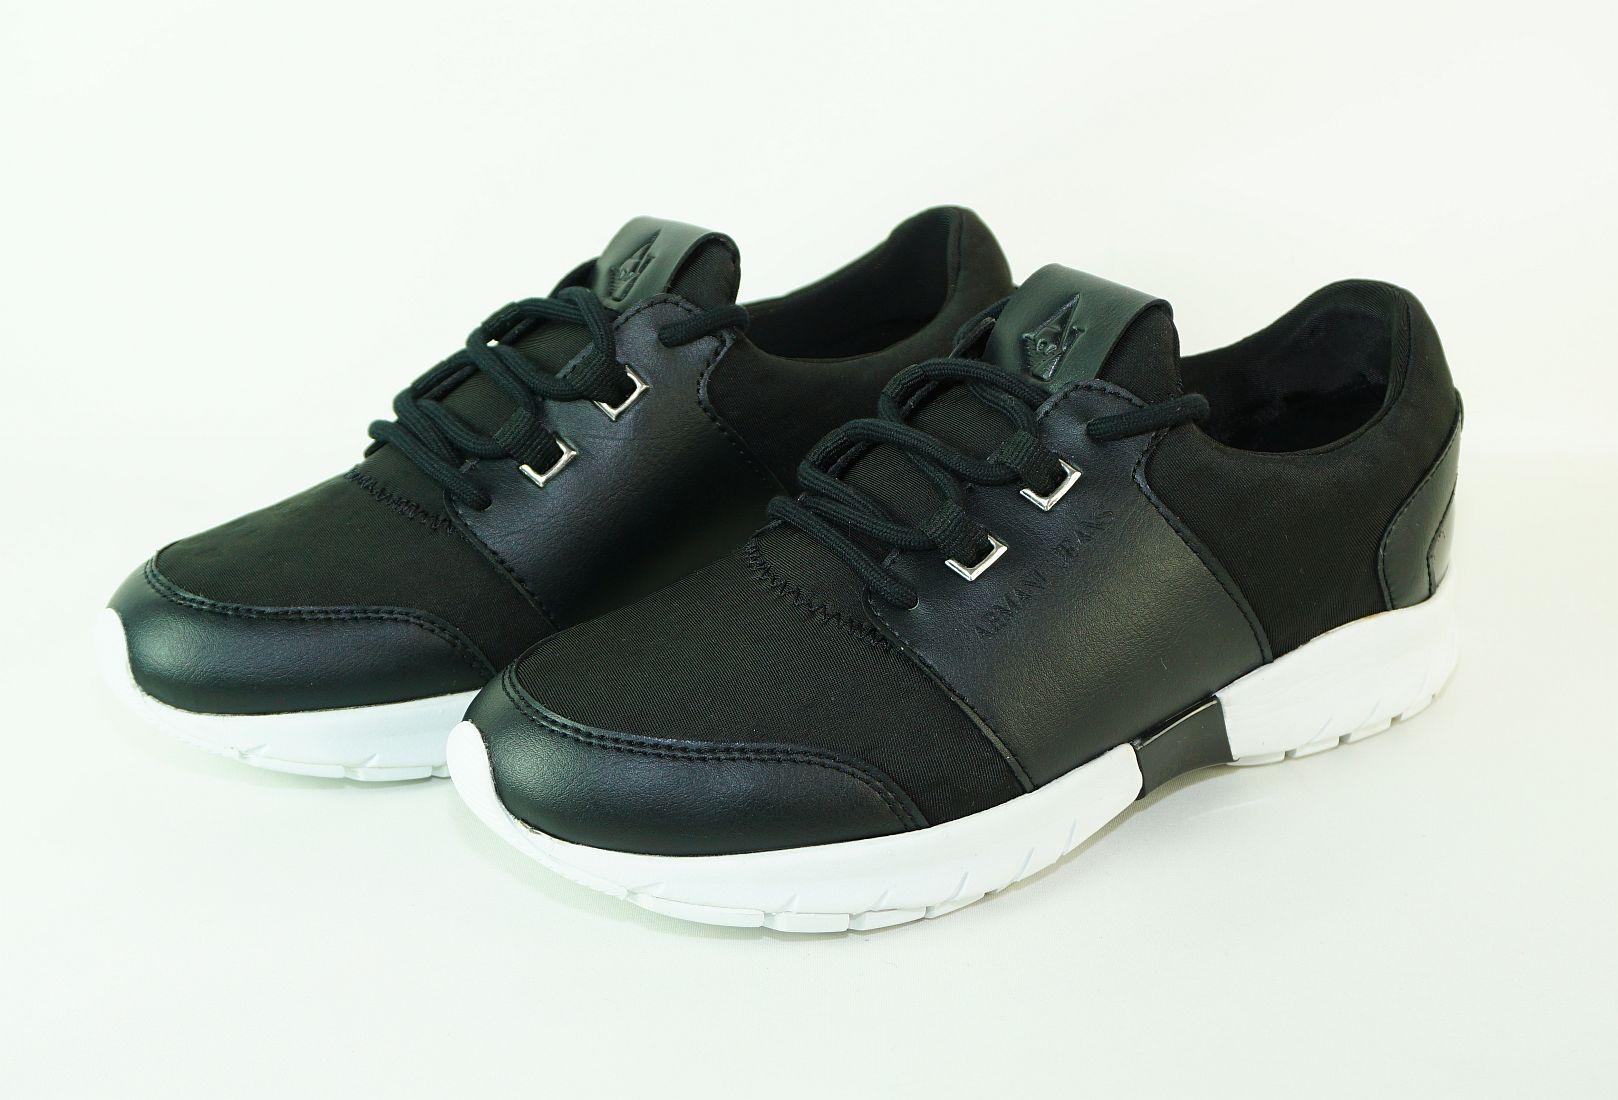 Armani Jeans Schnürschuhe Sneaker Runner 925178 7P565 00020 Nero schwarz S17-AJS1